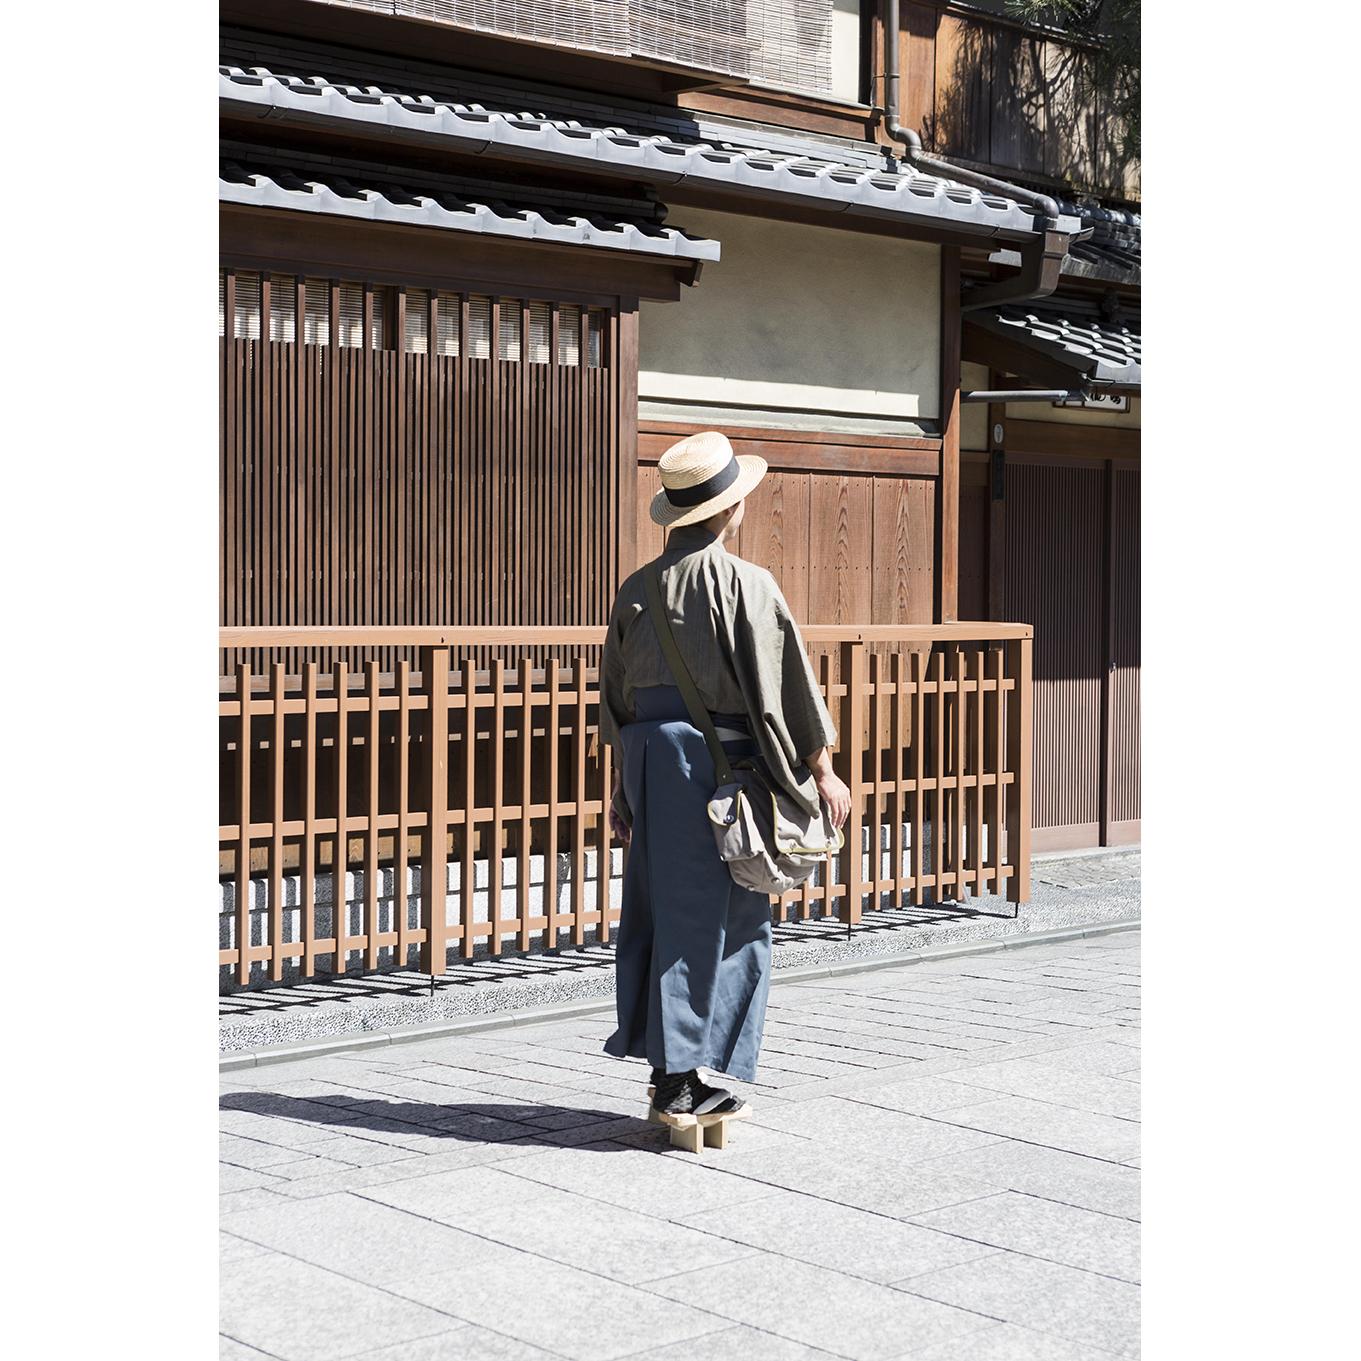 japan_0553 copy.jpg